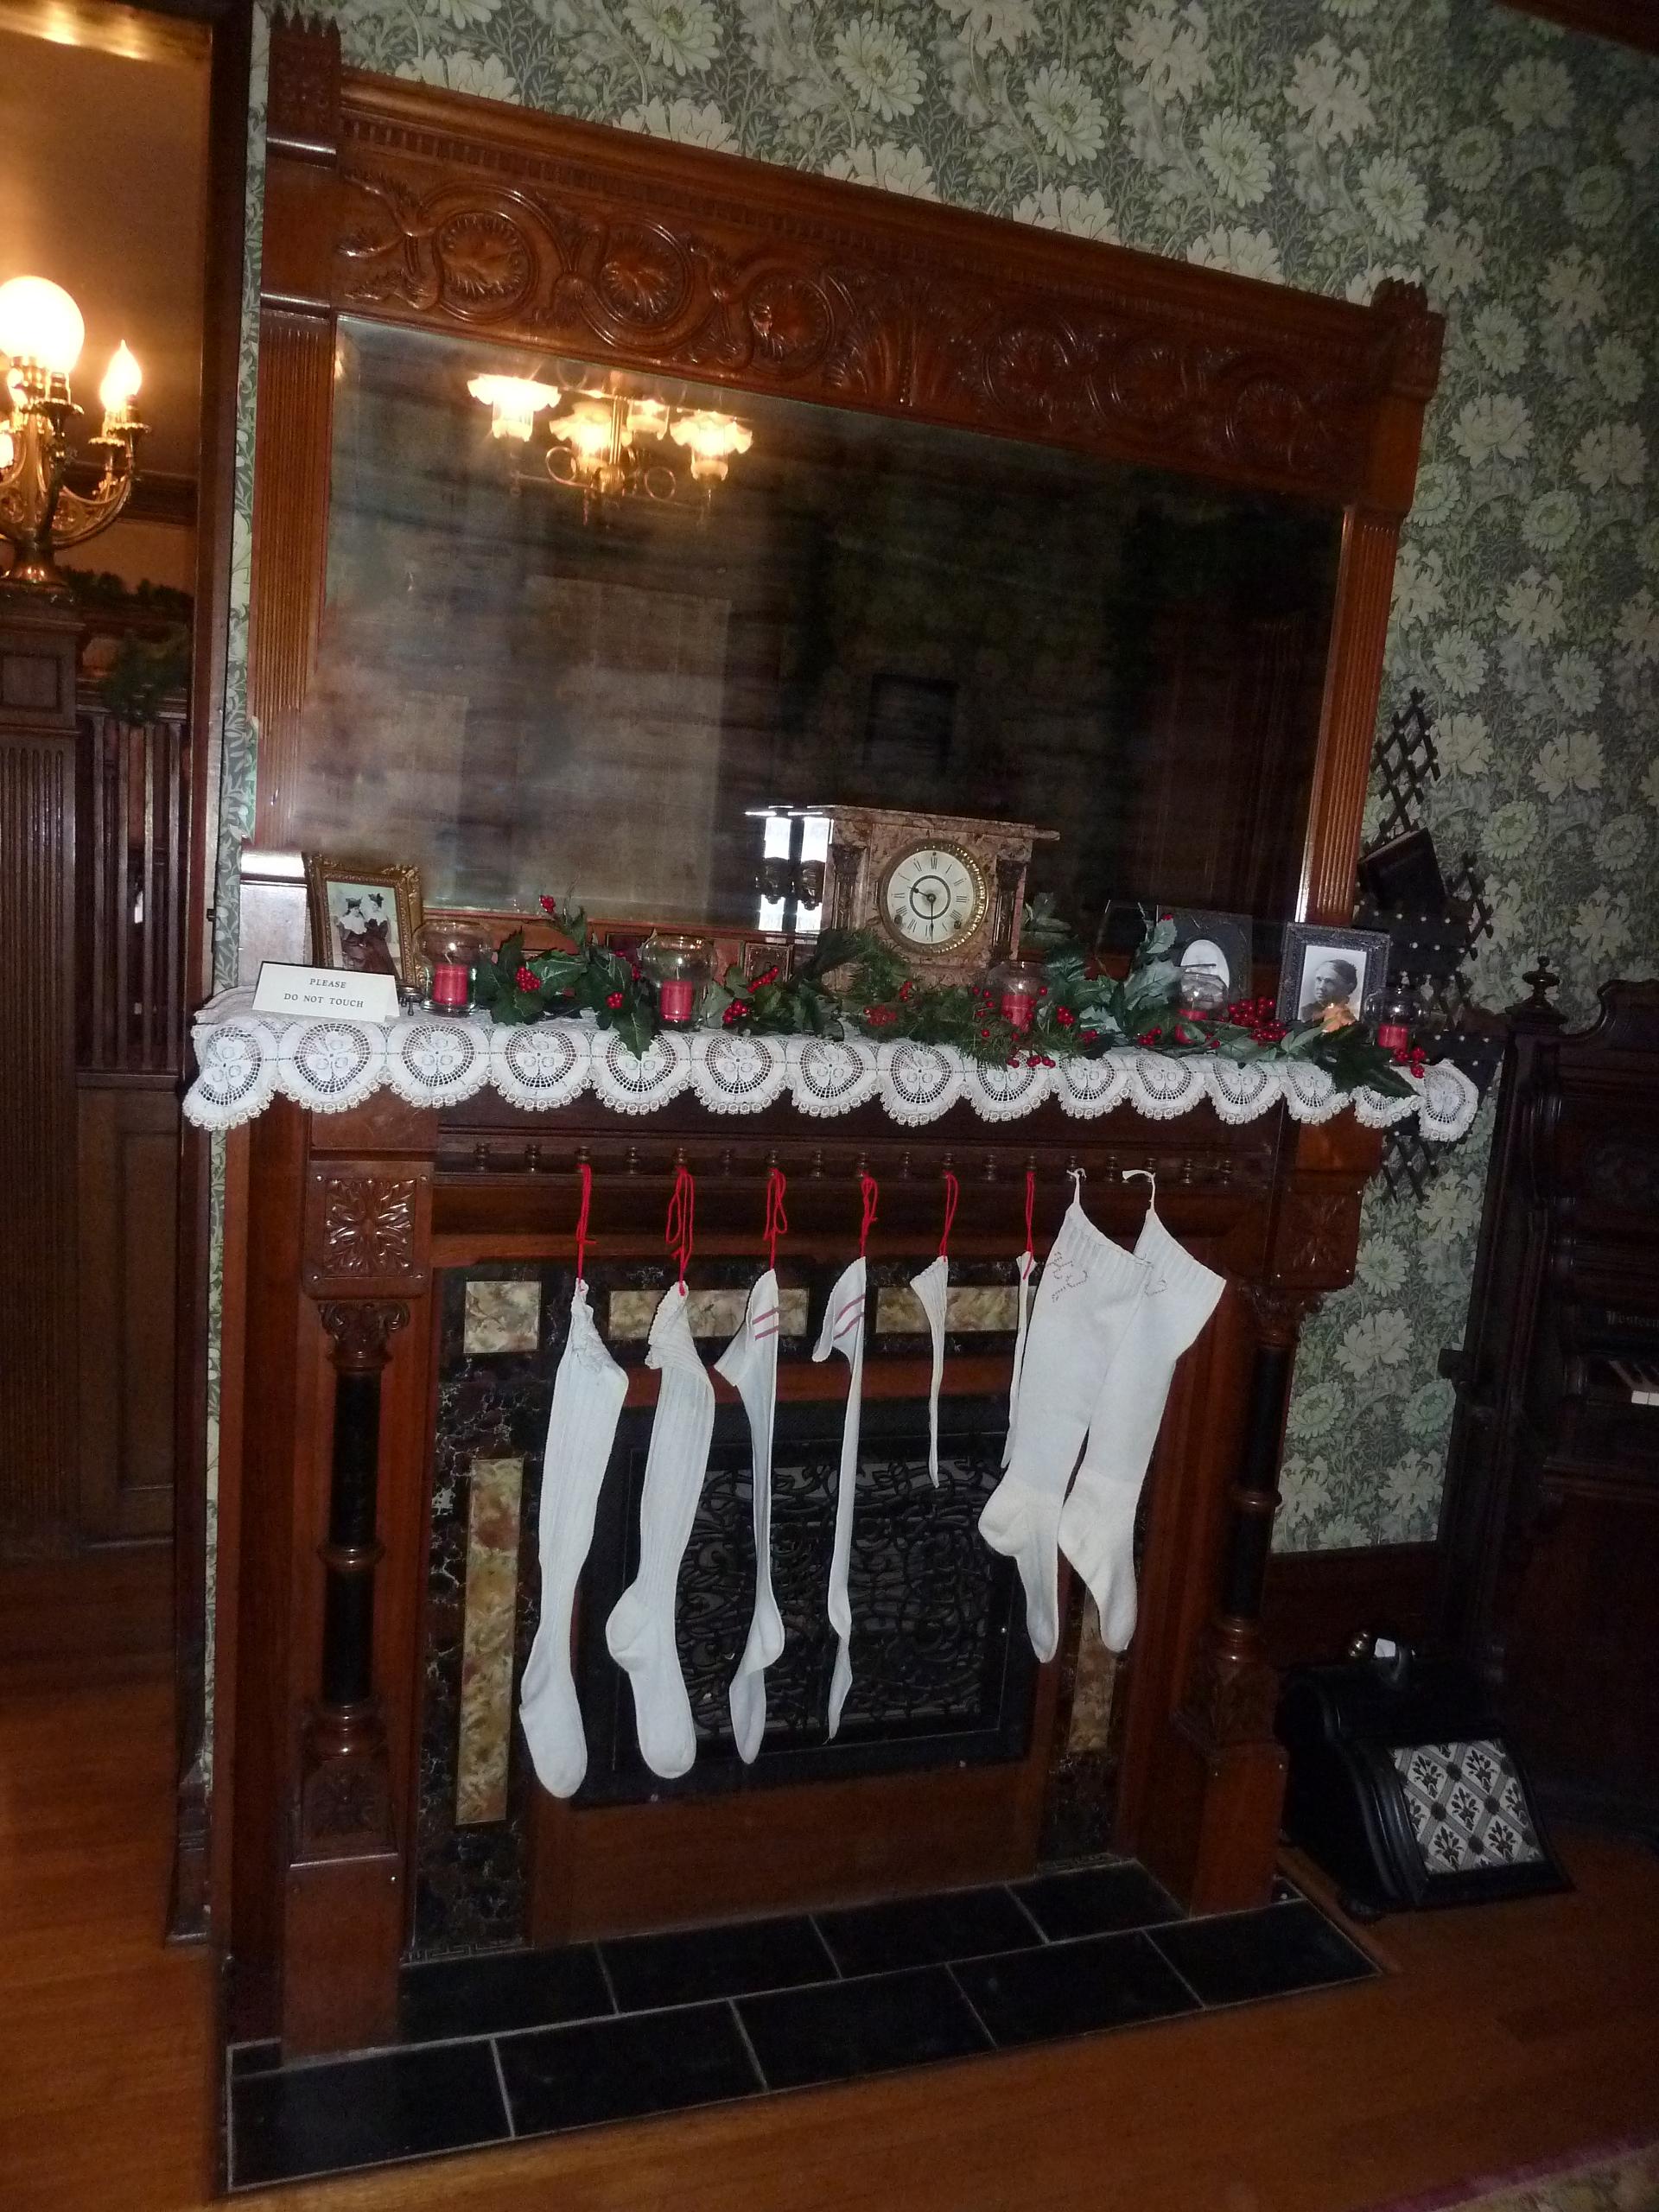 2012 AH Holiday Stockings.jpg